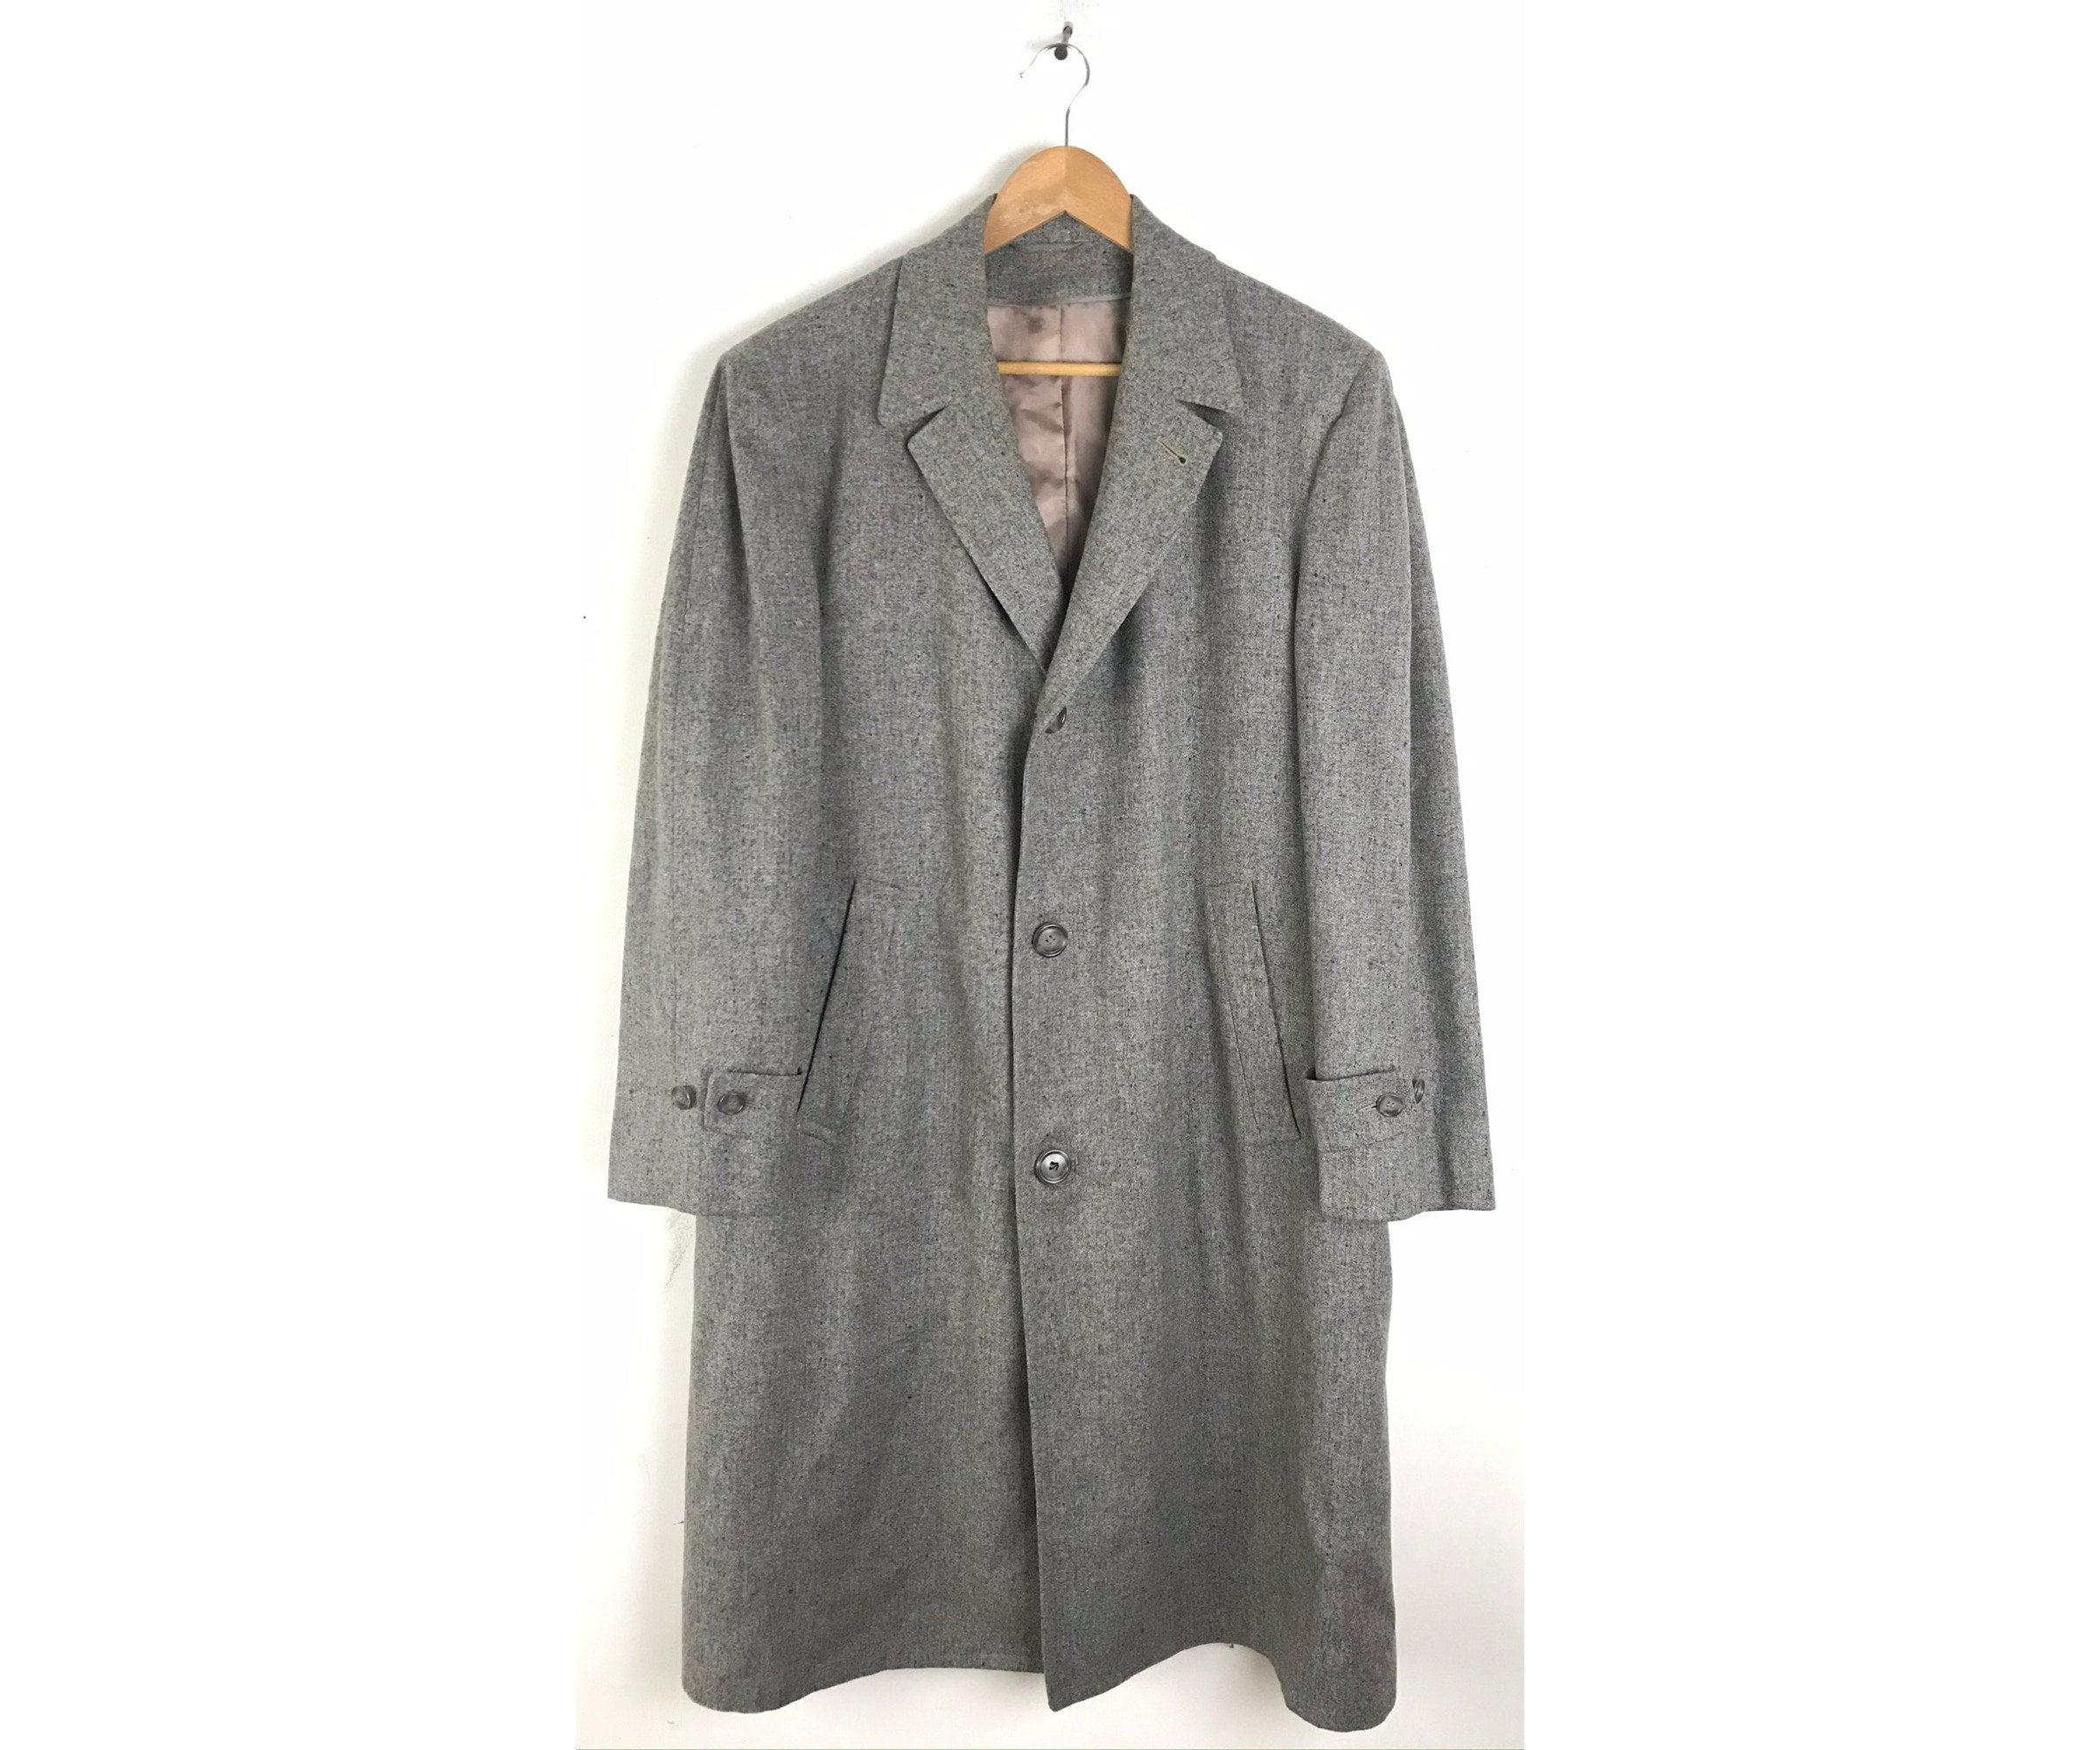 1950s Mens Hats | 50s Vintage Men's Hats 50S Gray Marbled Wool Overcoat With Plaid Lining Mens Size Large, Vintage Coat, 1950S Robert Hall High End Coat $80.00 AT vintagedancer.com